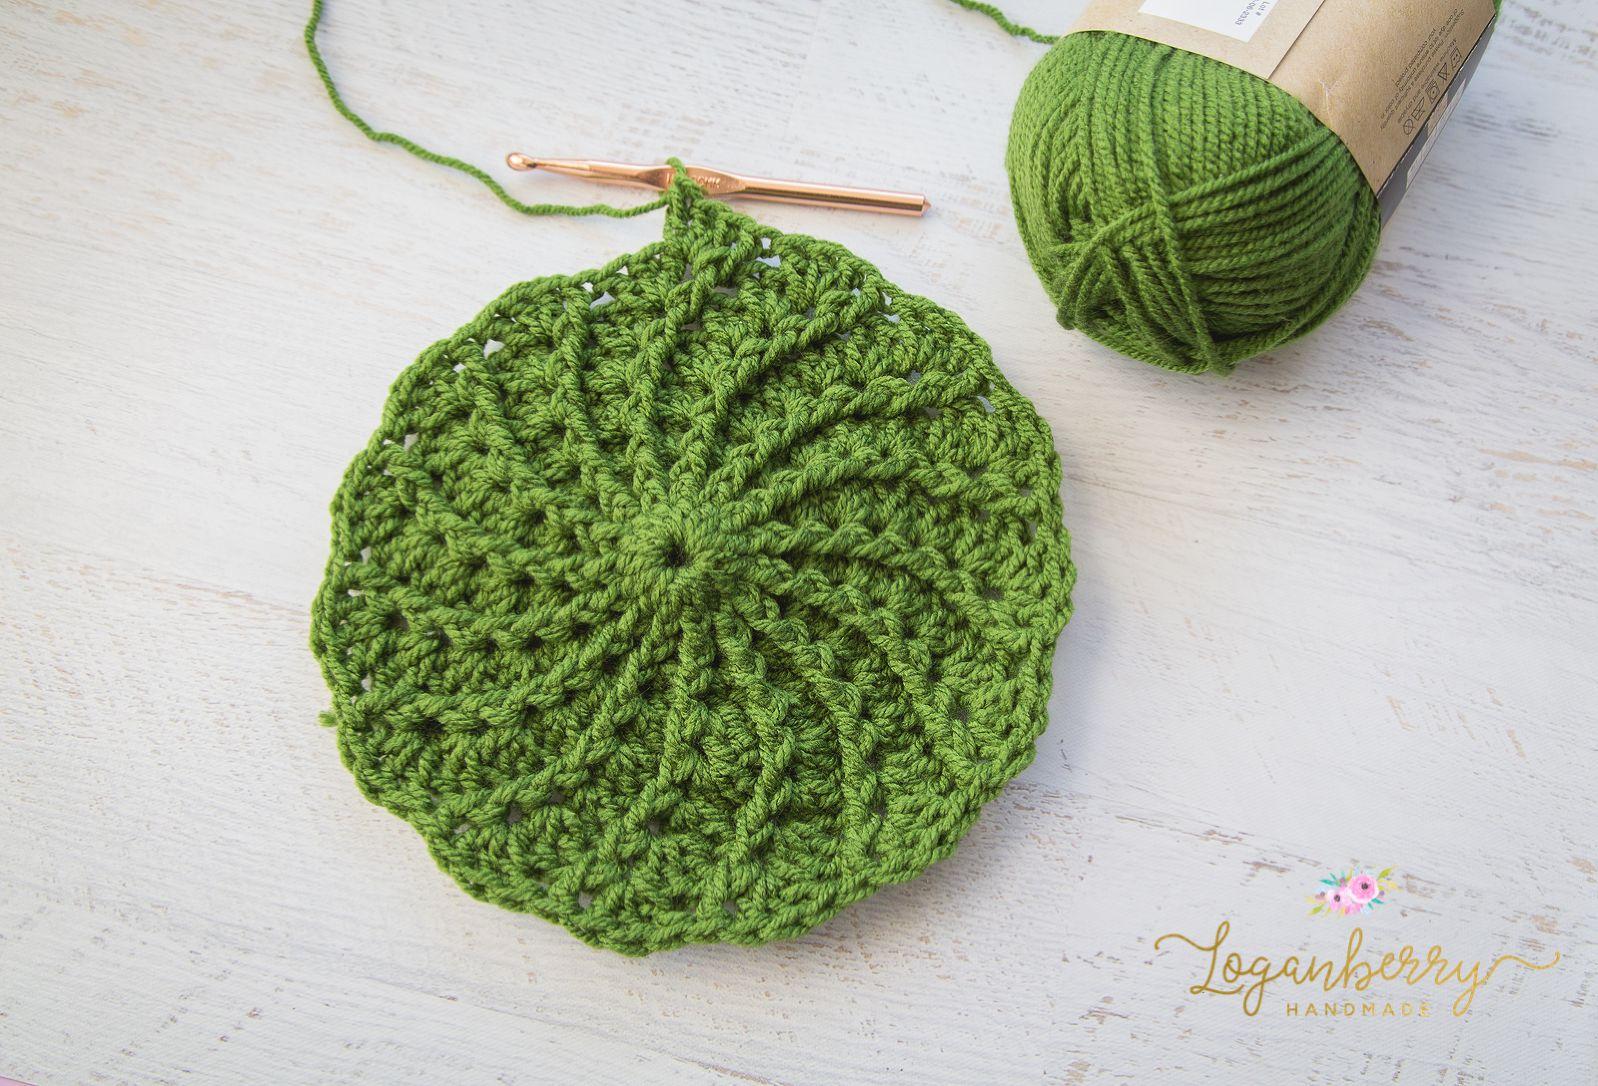 Spiral Crochet Pattern Simple Inspiration Design